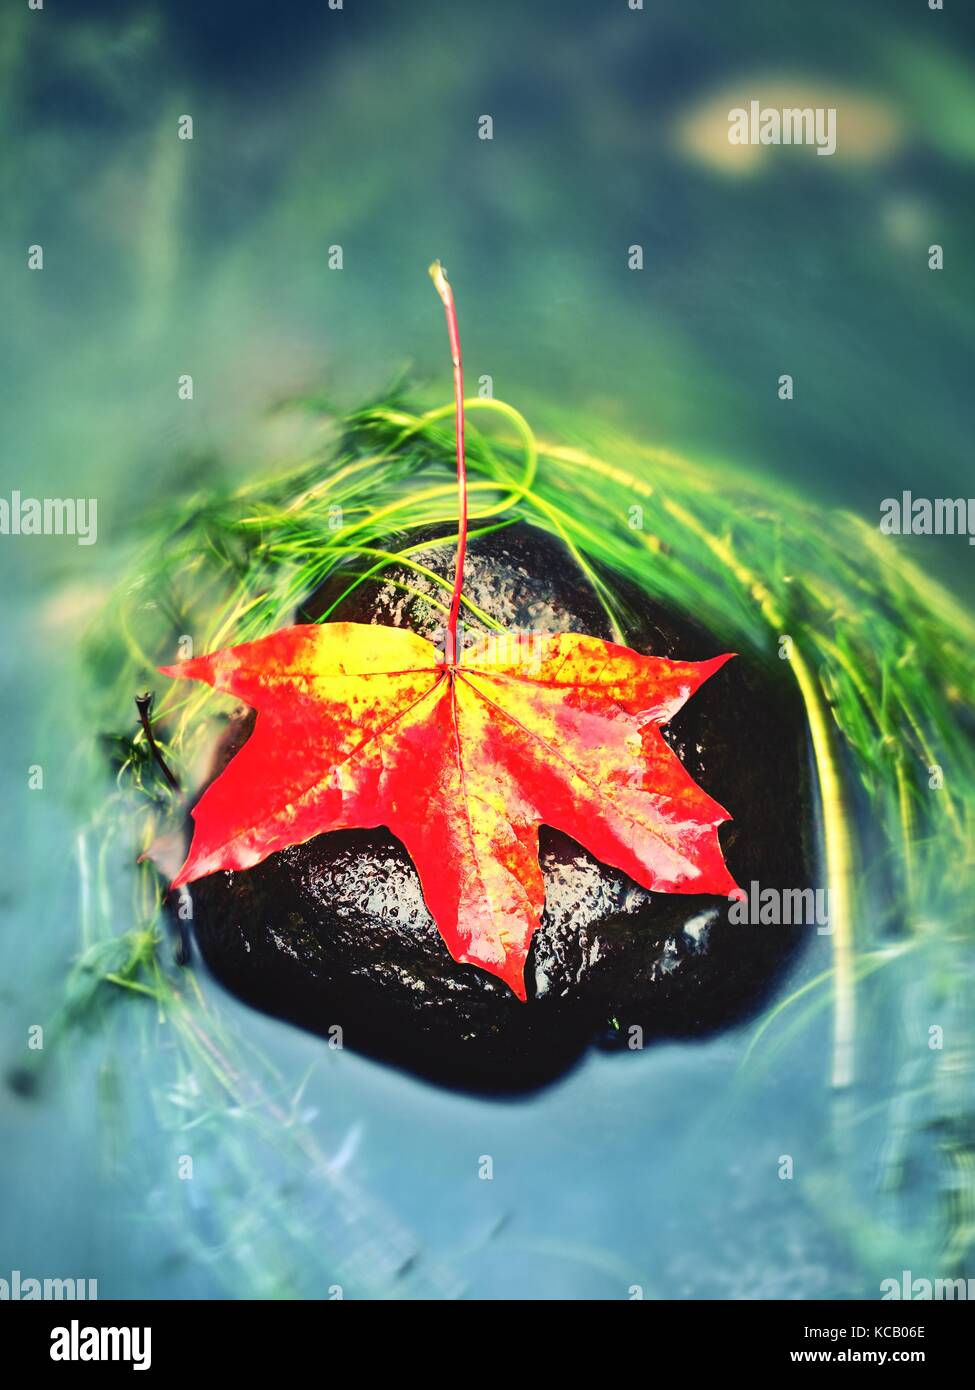 Caught yellow orange maple leaf on  long green algae stone. Colorful symbol of comming fall season. Boulder in mirror - Stock Image